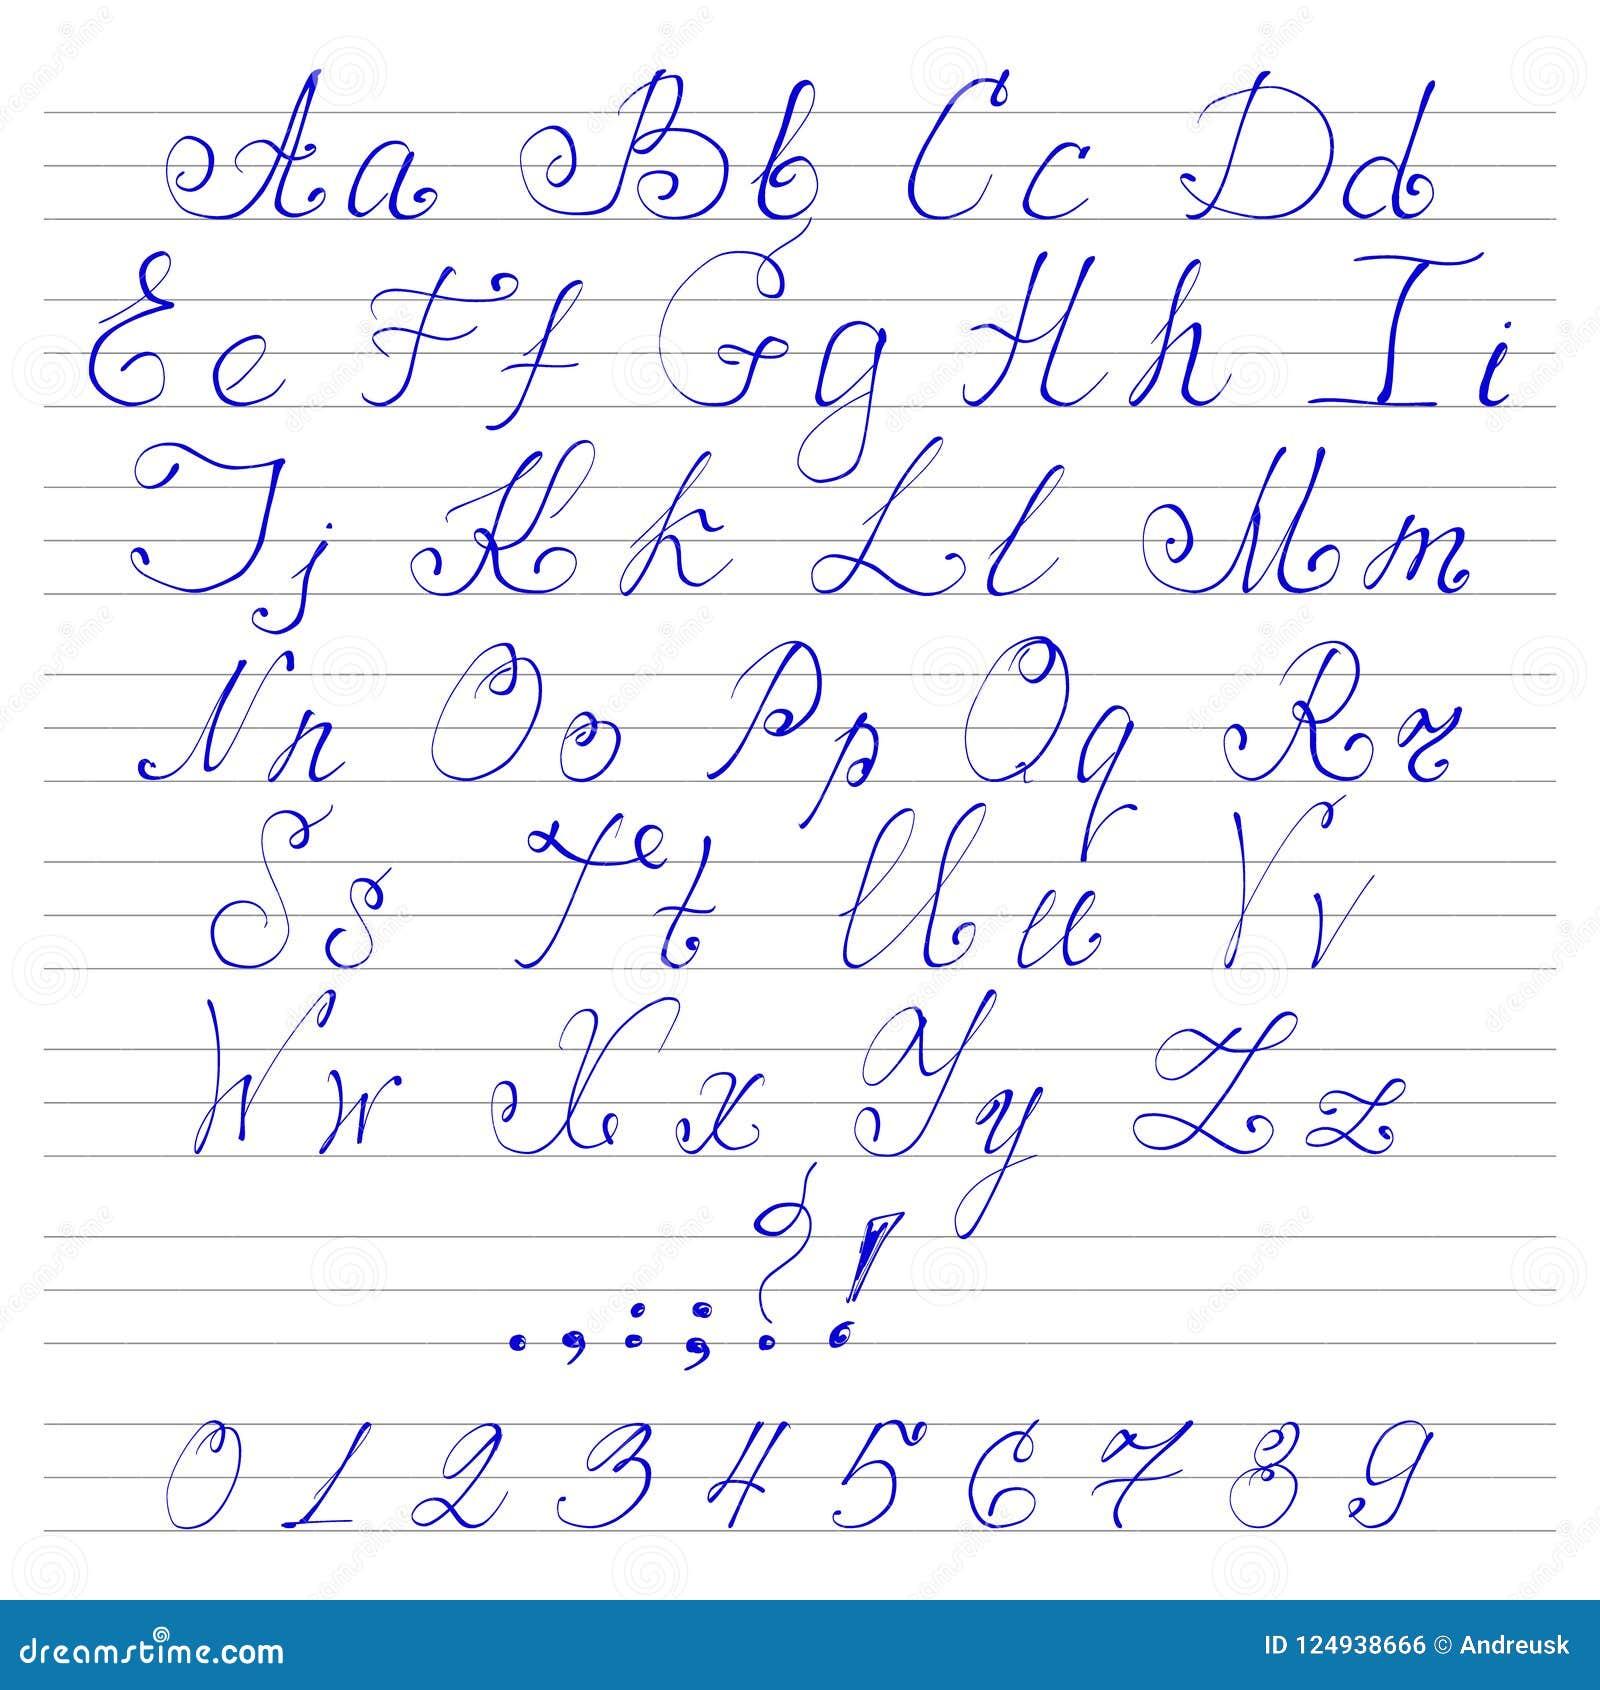 Alphabet handwriting fonts stock vector. Illustration of handwriting ...